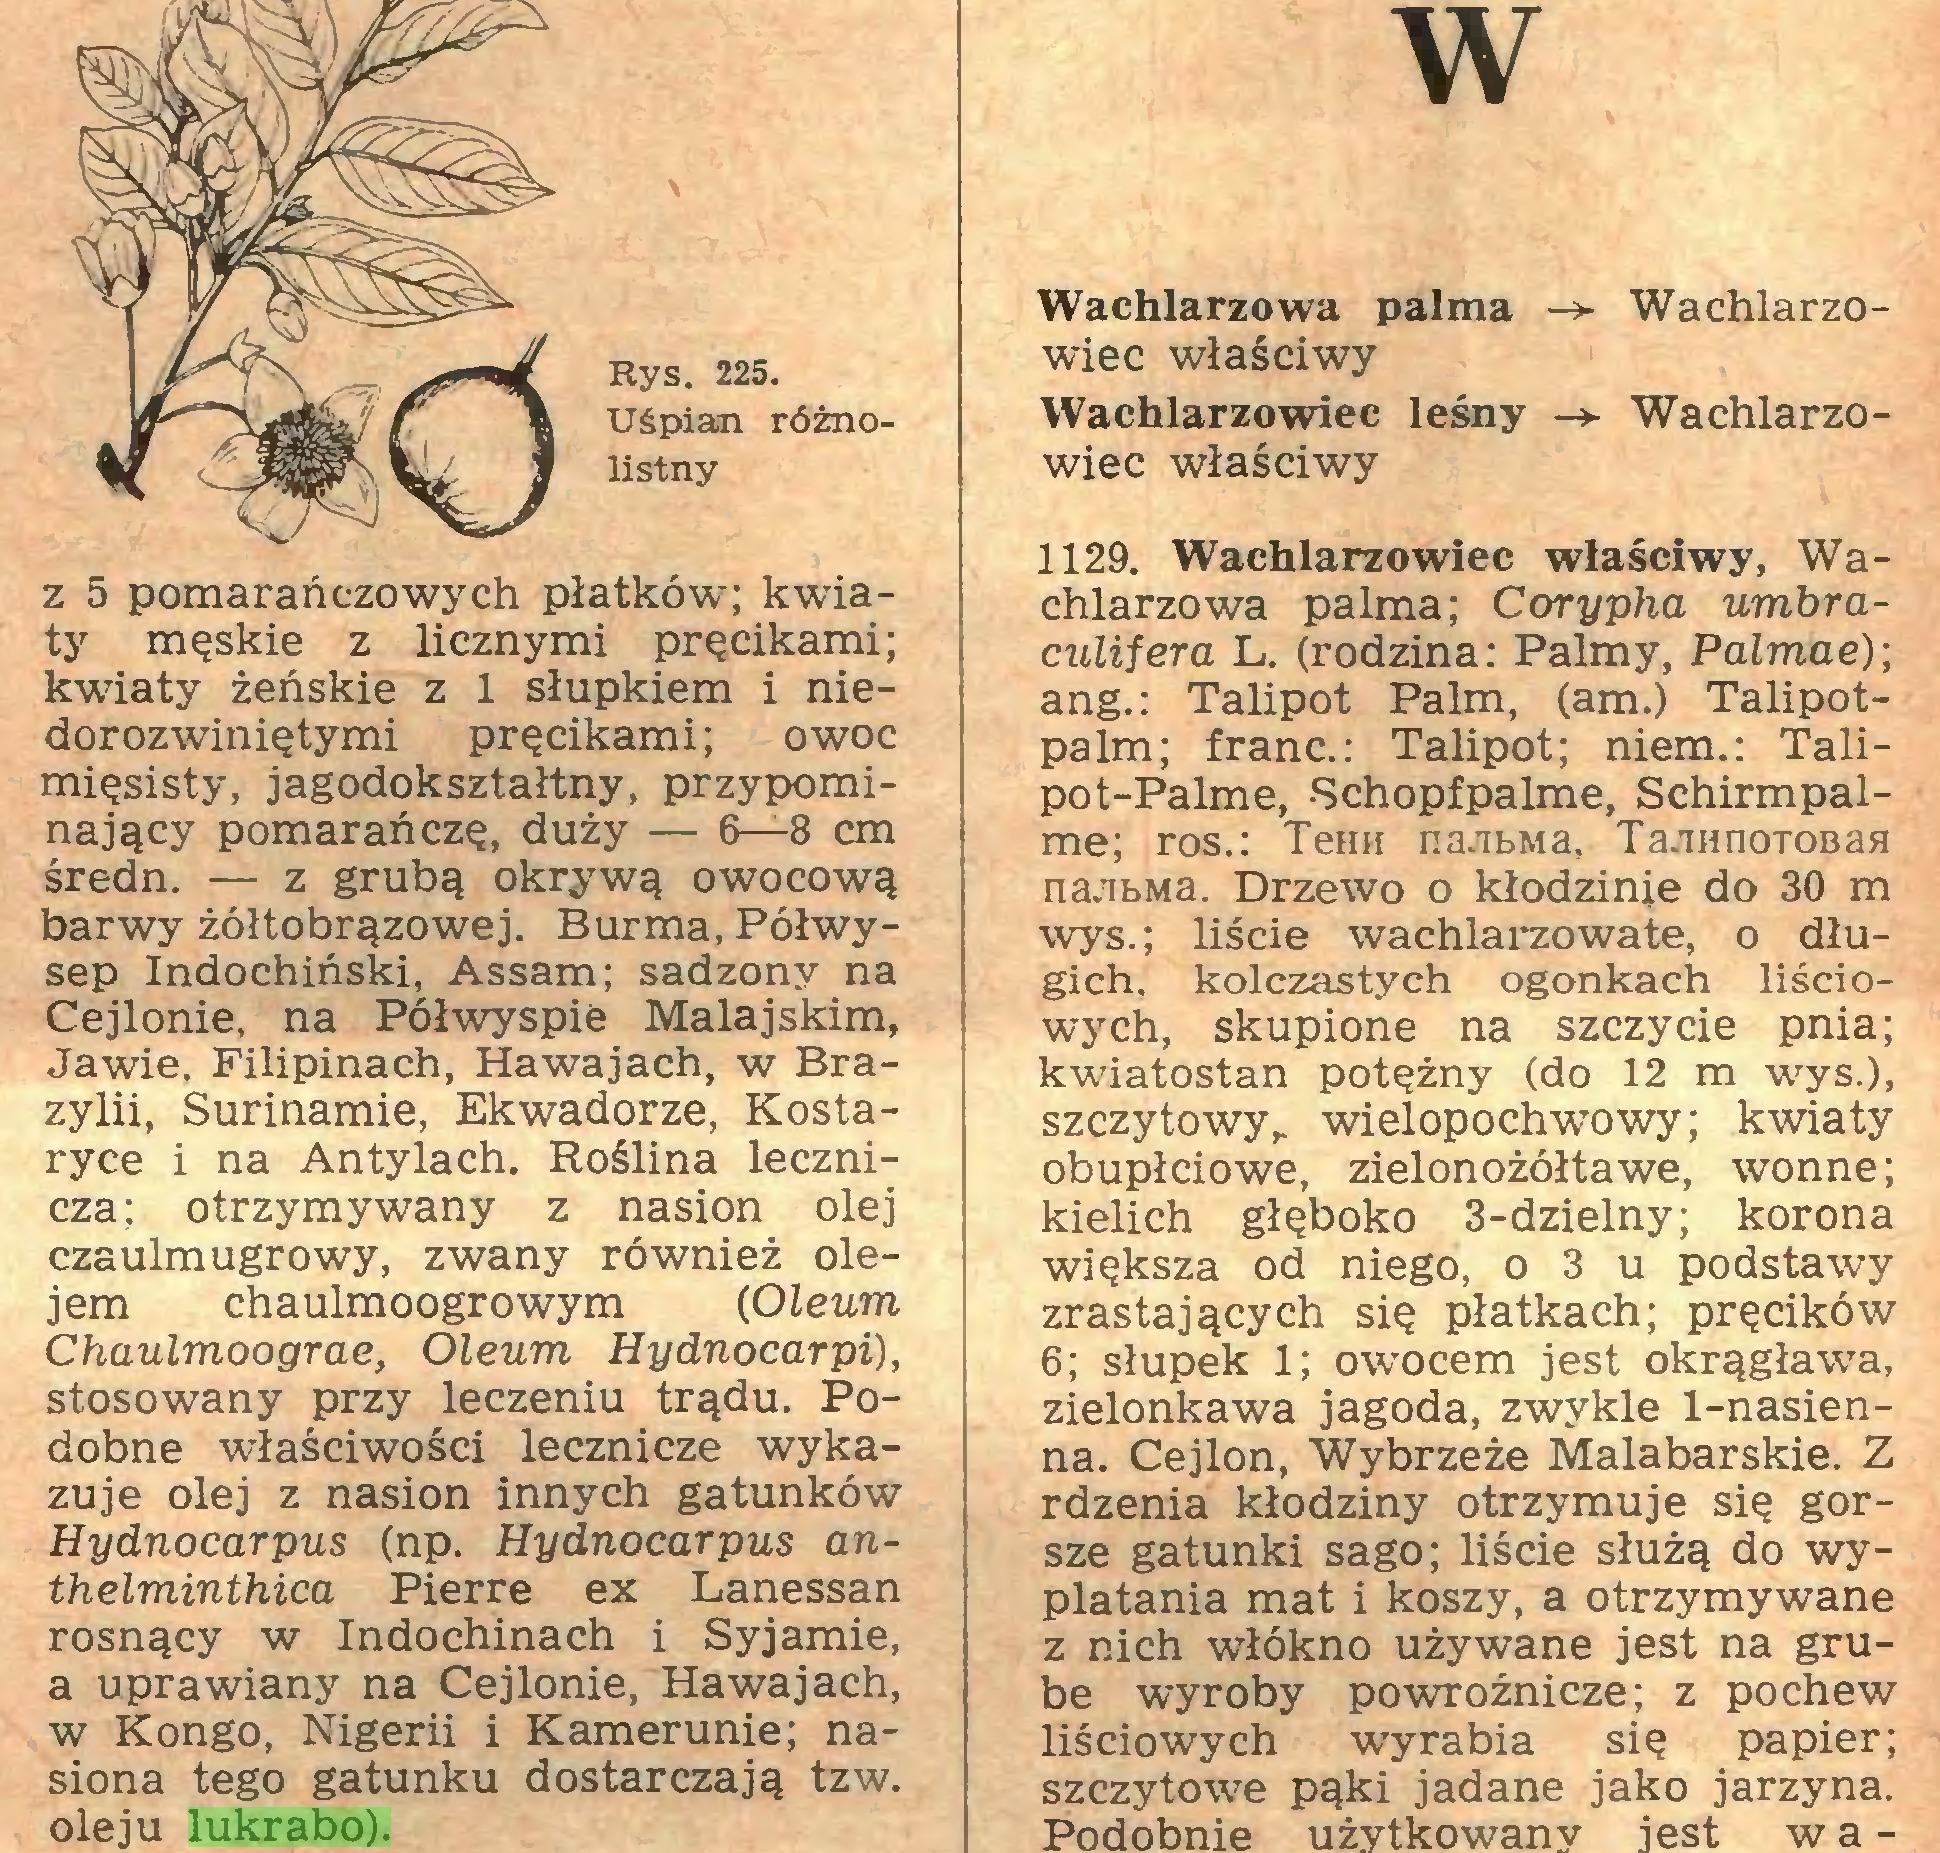 (...) oleju lukrabo). W Wachlarzowa palma -> Wachlarzowiec właściwy Wachlarzowiec leśny -► Wachlarzowiec właściwy 1129. Wachlarzowiec właściwy, Wa...